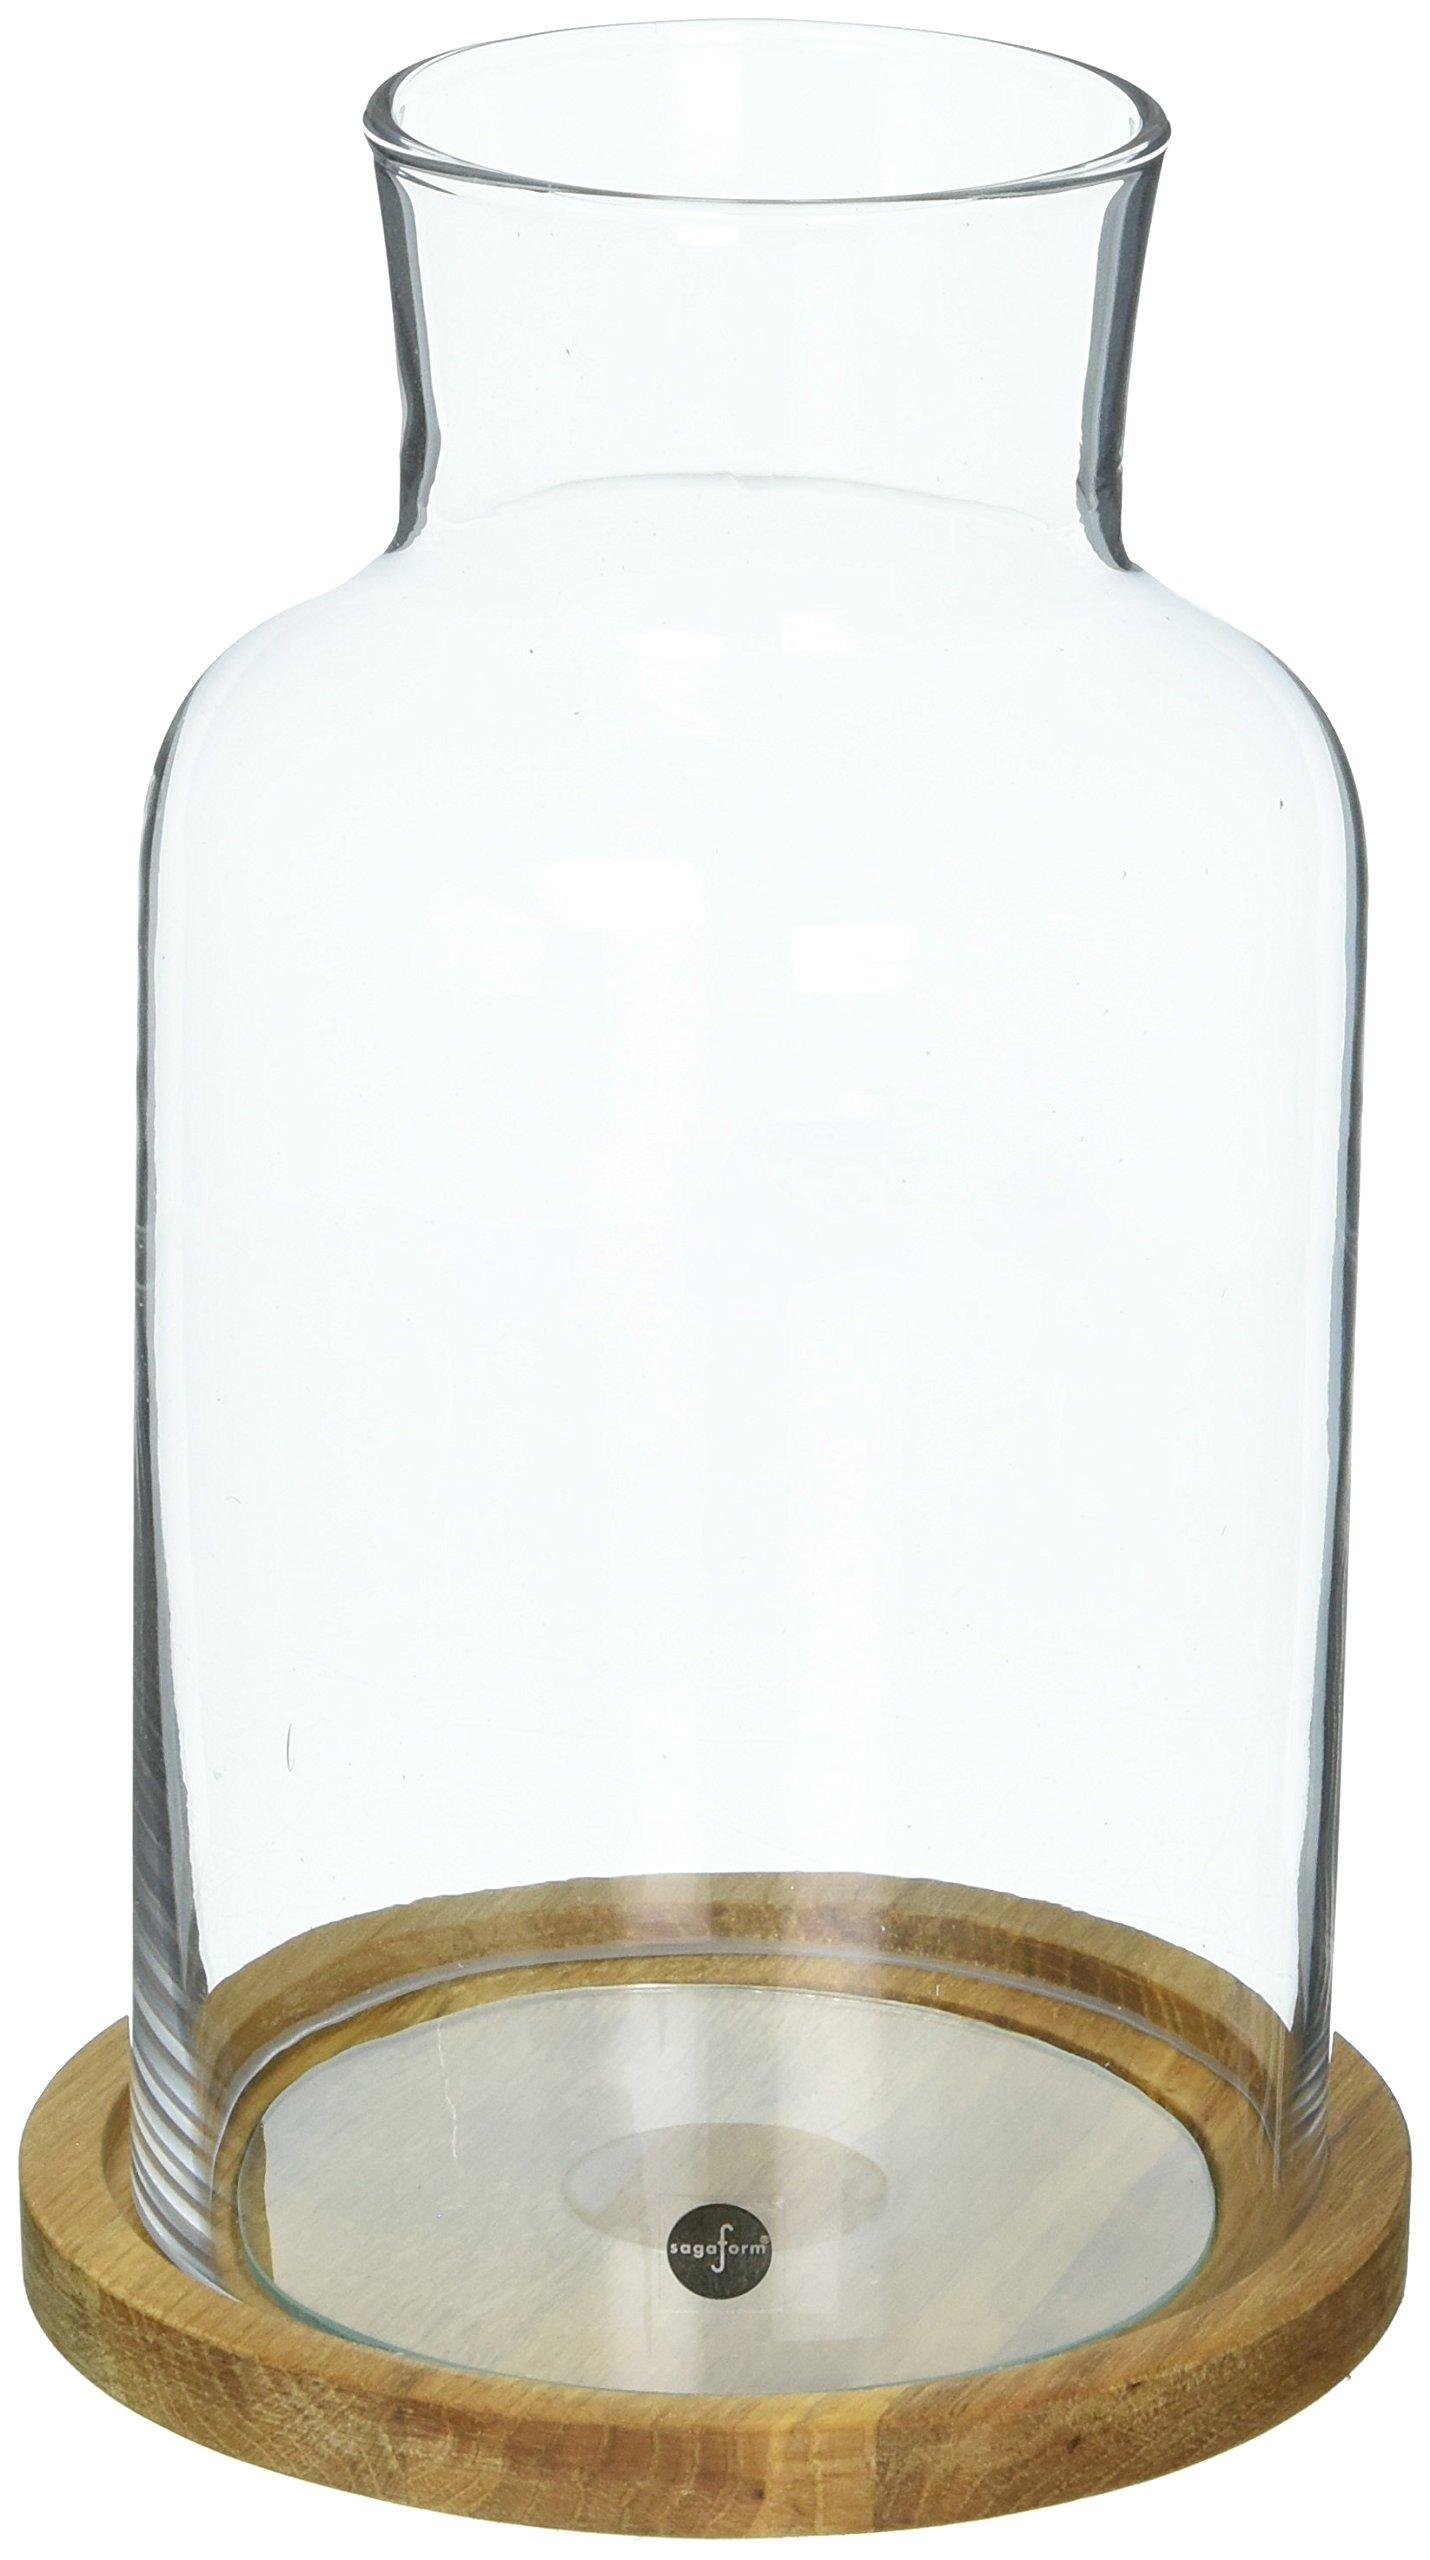 Sagaform Candleholder/Lantern Hurricane Candle Holder with Glass and Oak Base, 5'' X 8 1/2'', Medium, Clear/Brown